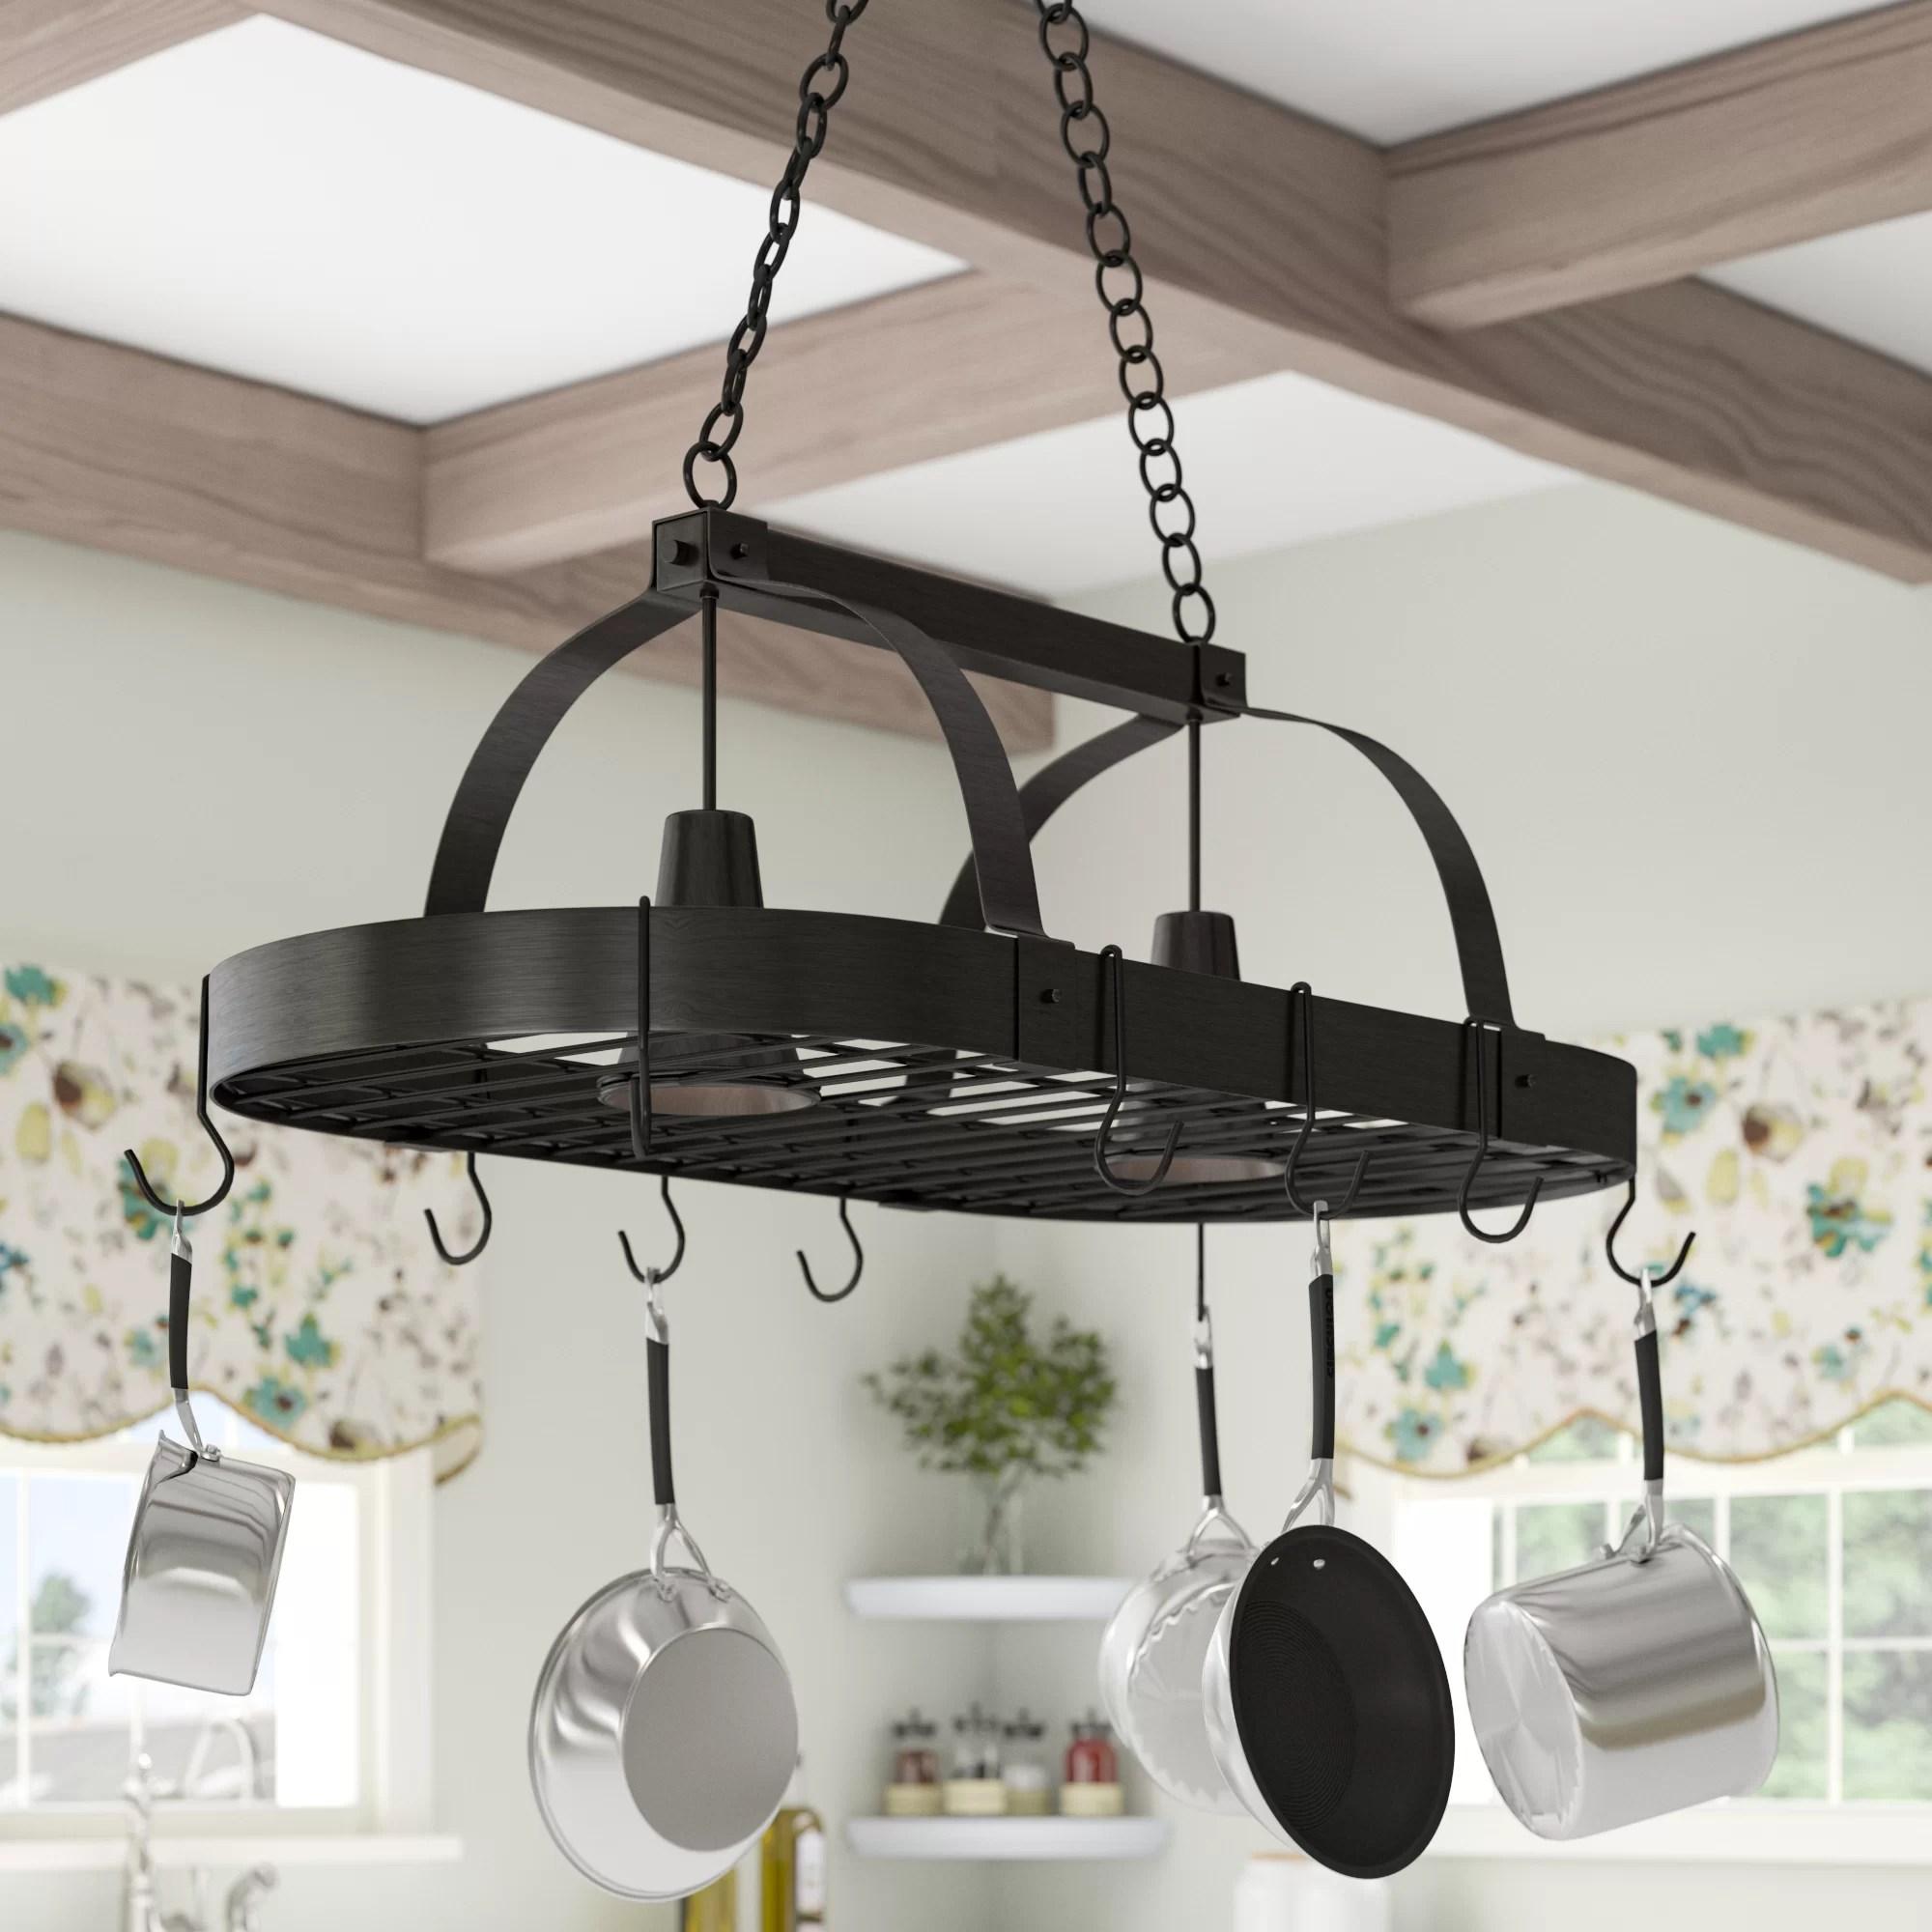 adrik 2 light kitchen hanging pot rack